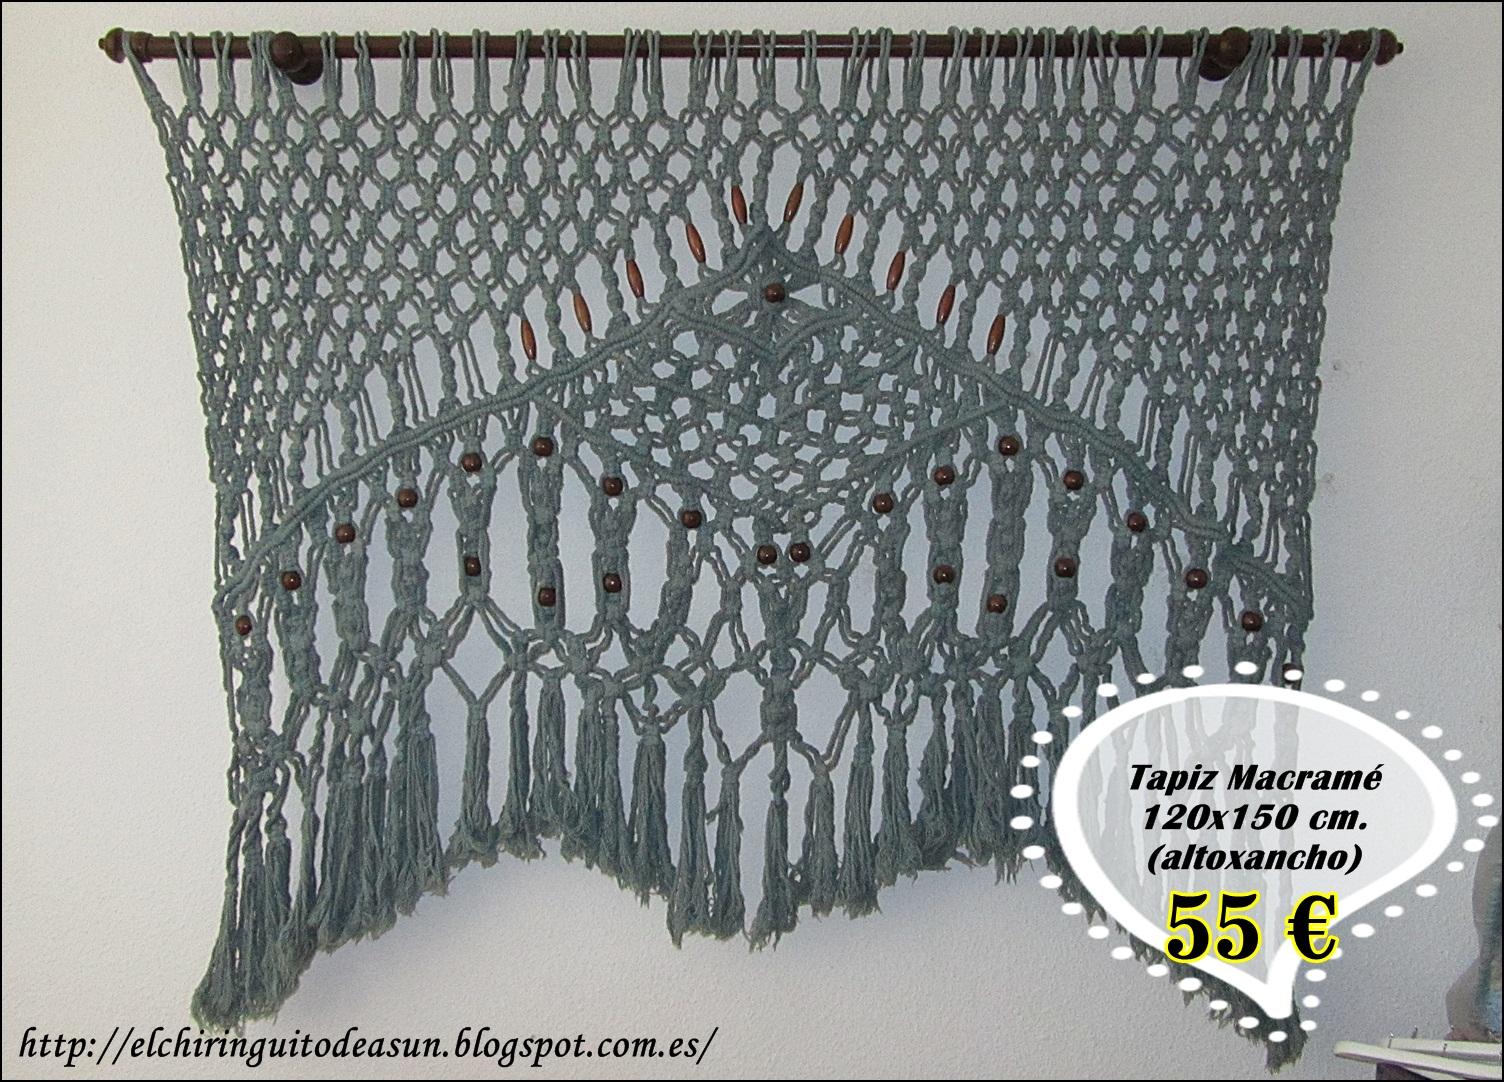 El chiringuito de asun tapices de macram - Tapices de macrame ...